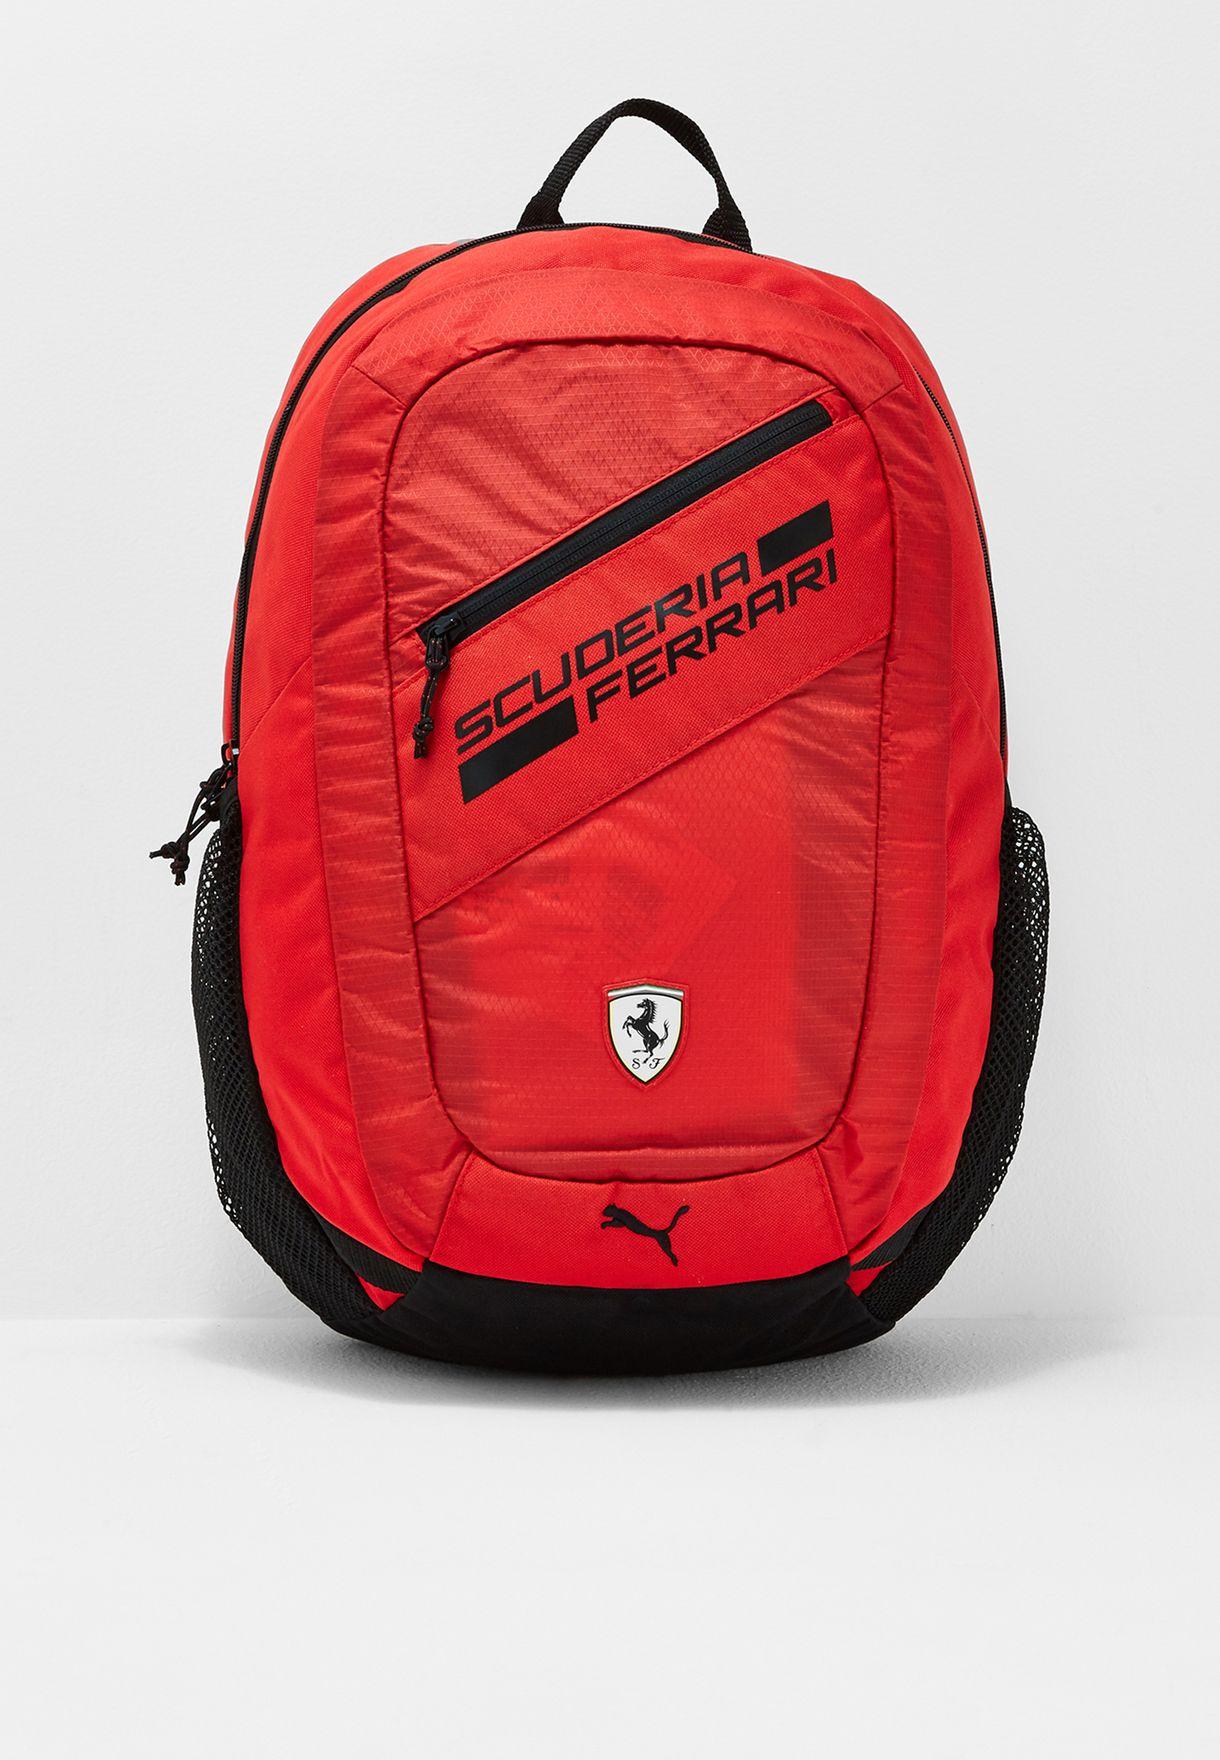 8faeef89cfa05 Shop PUMA red Ferrari Fanwear Backpack 07477601 for Kids in UAE ...